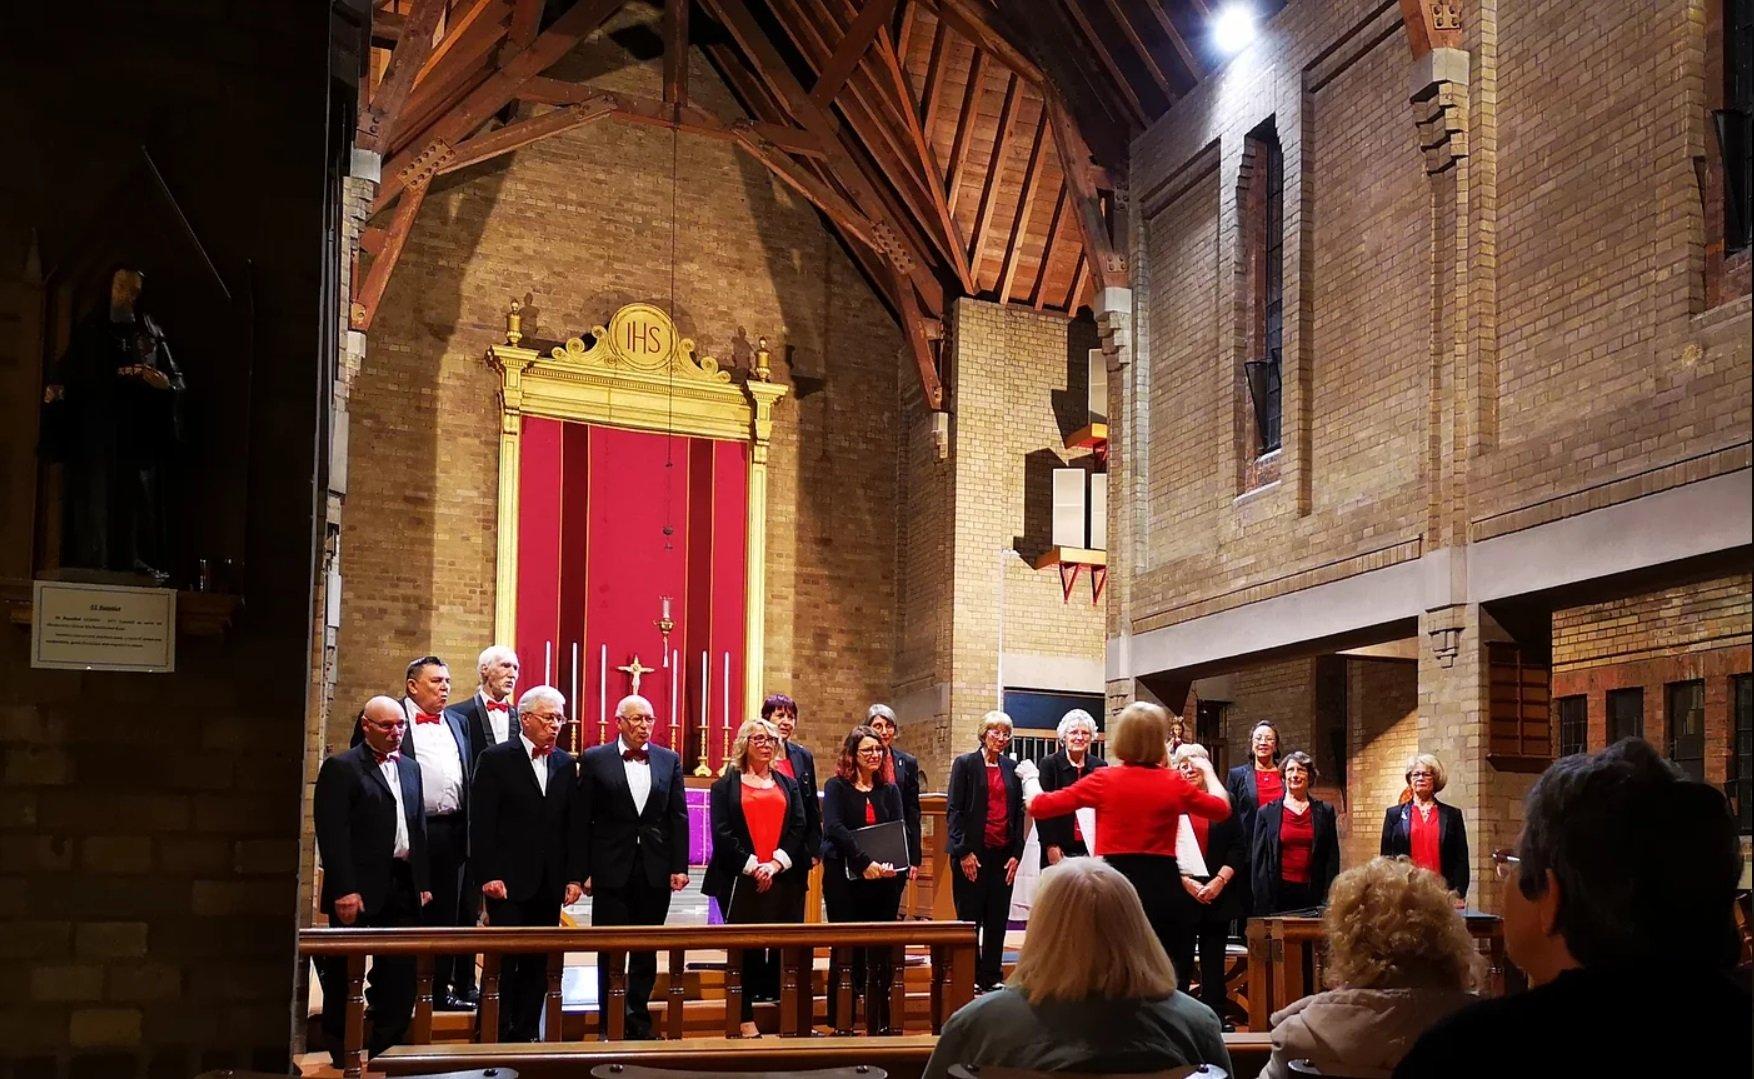 Dagger Lane Singers. Images property of Greatfield Community Choir © Daniel Watts